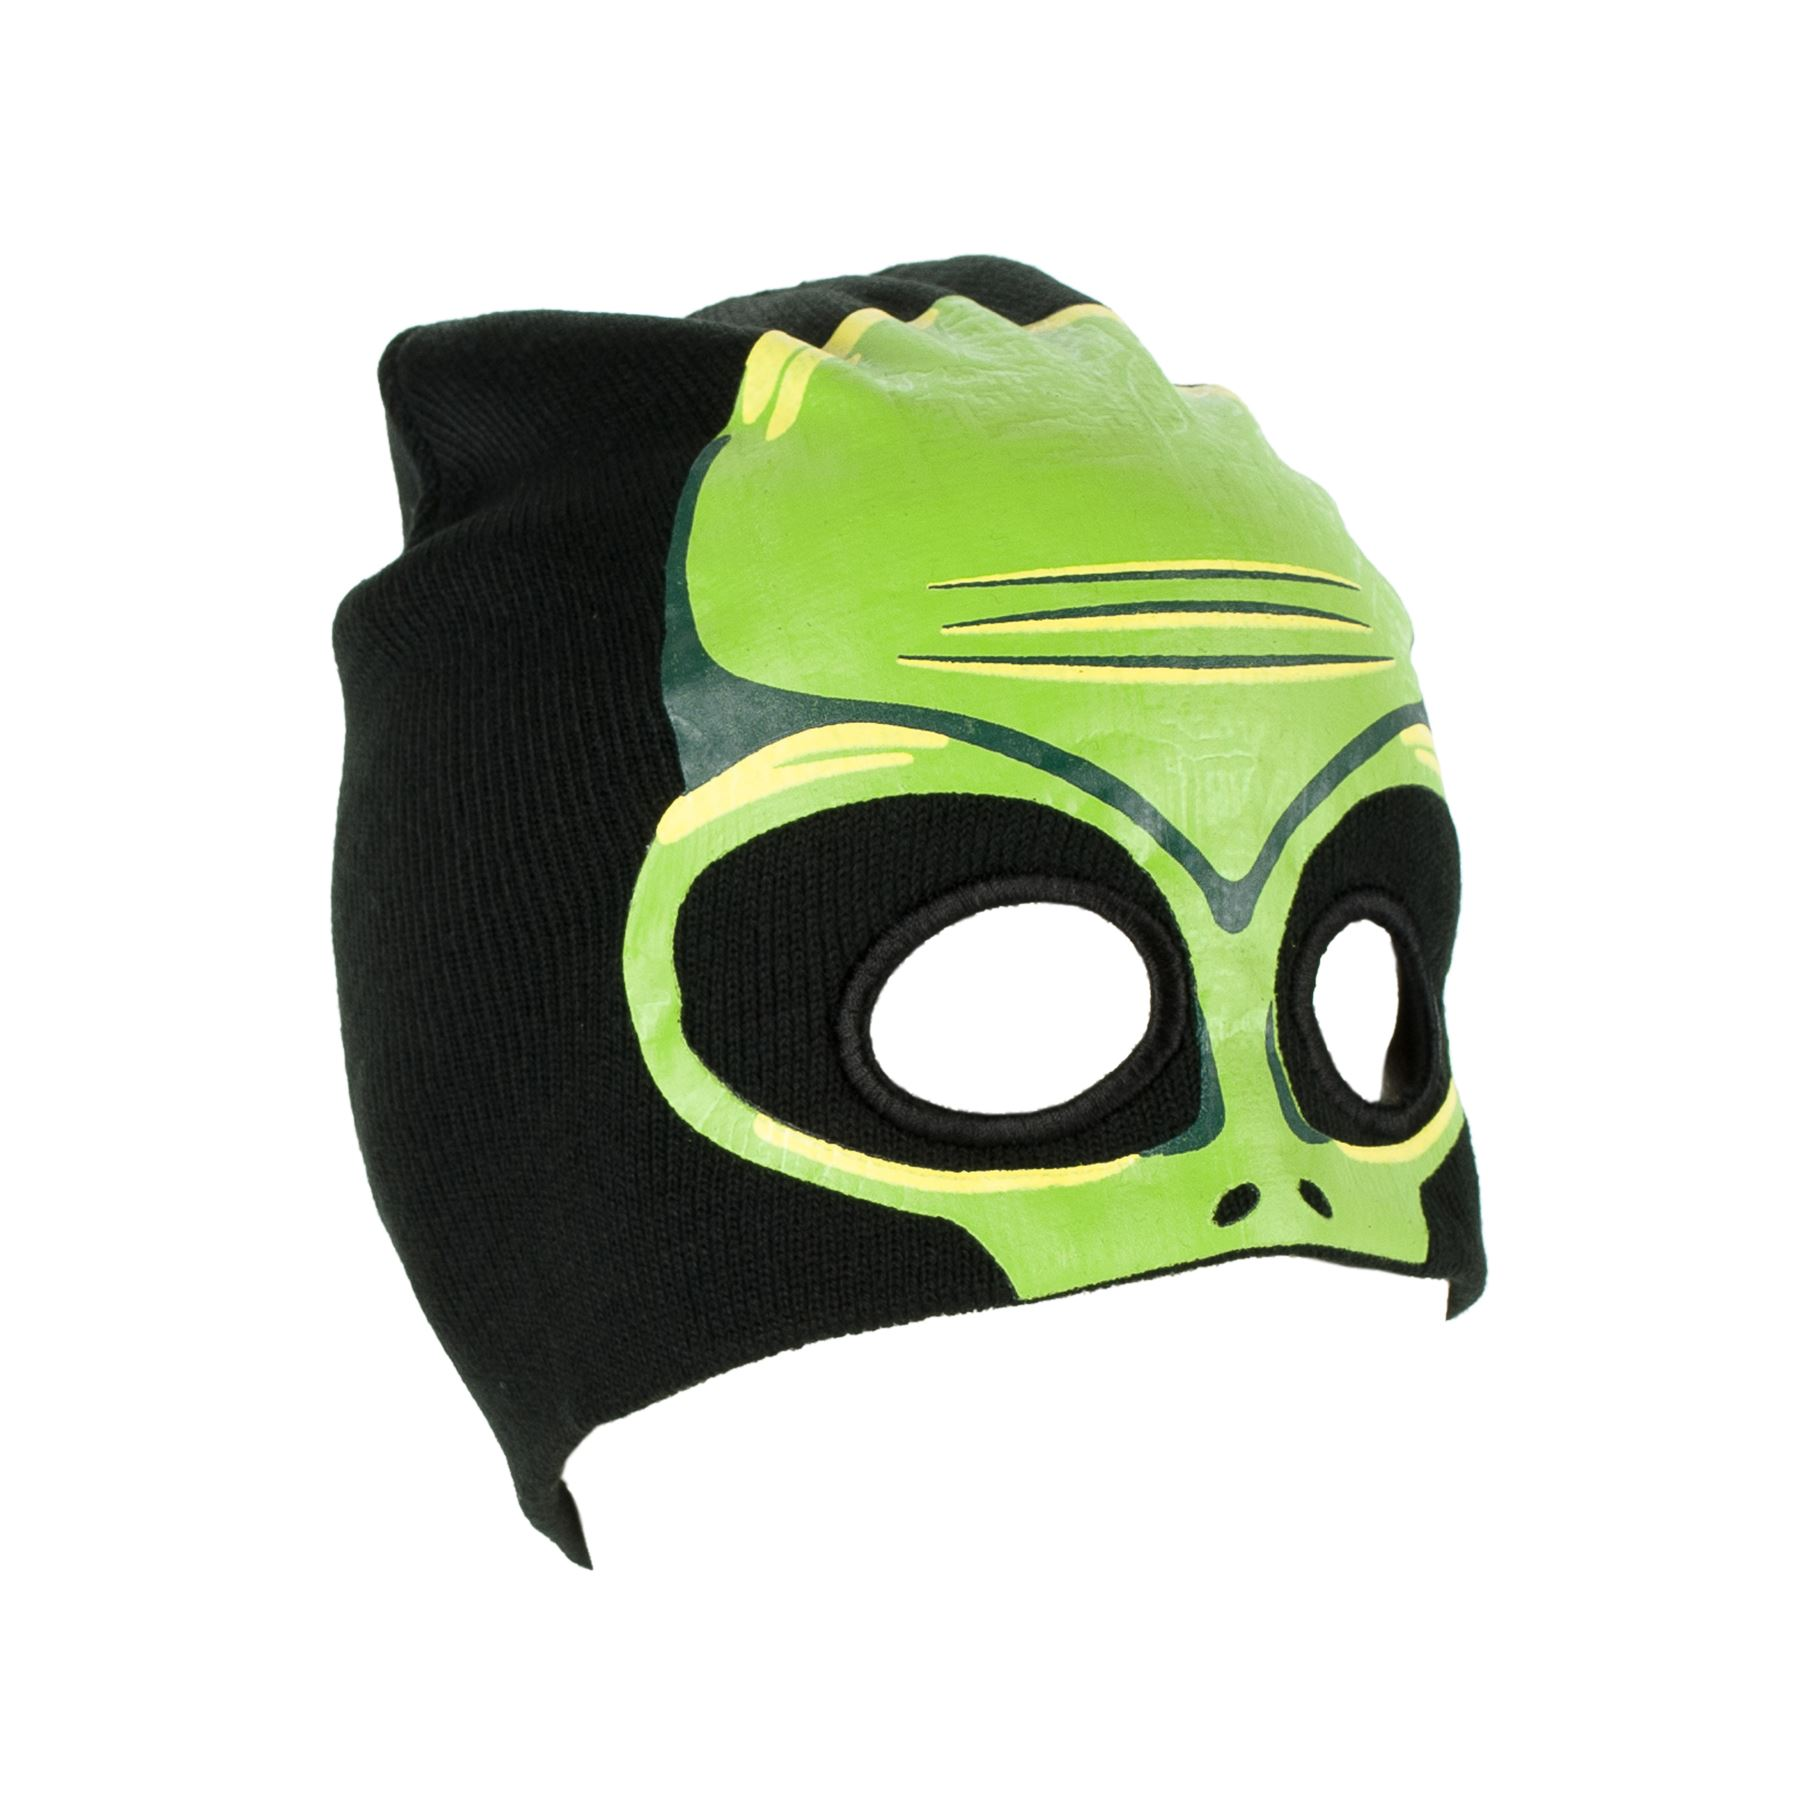 833d887daf9 Beanie-Hat-Mask-Balaclava-with-Eye-Holes thumbnail 3